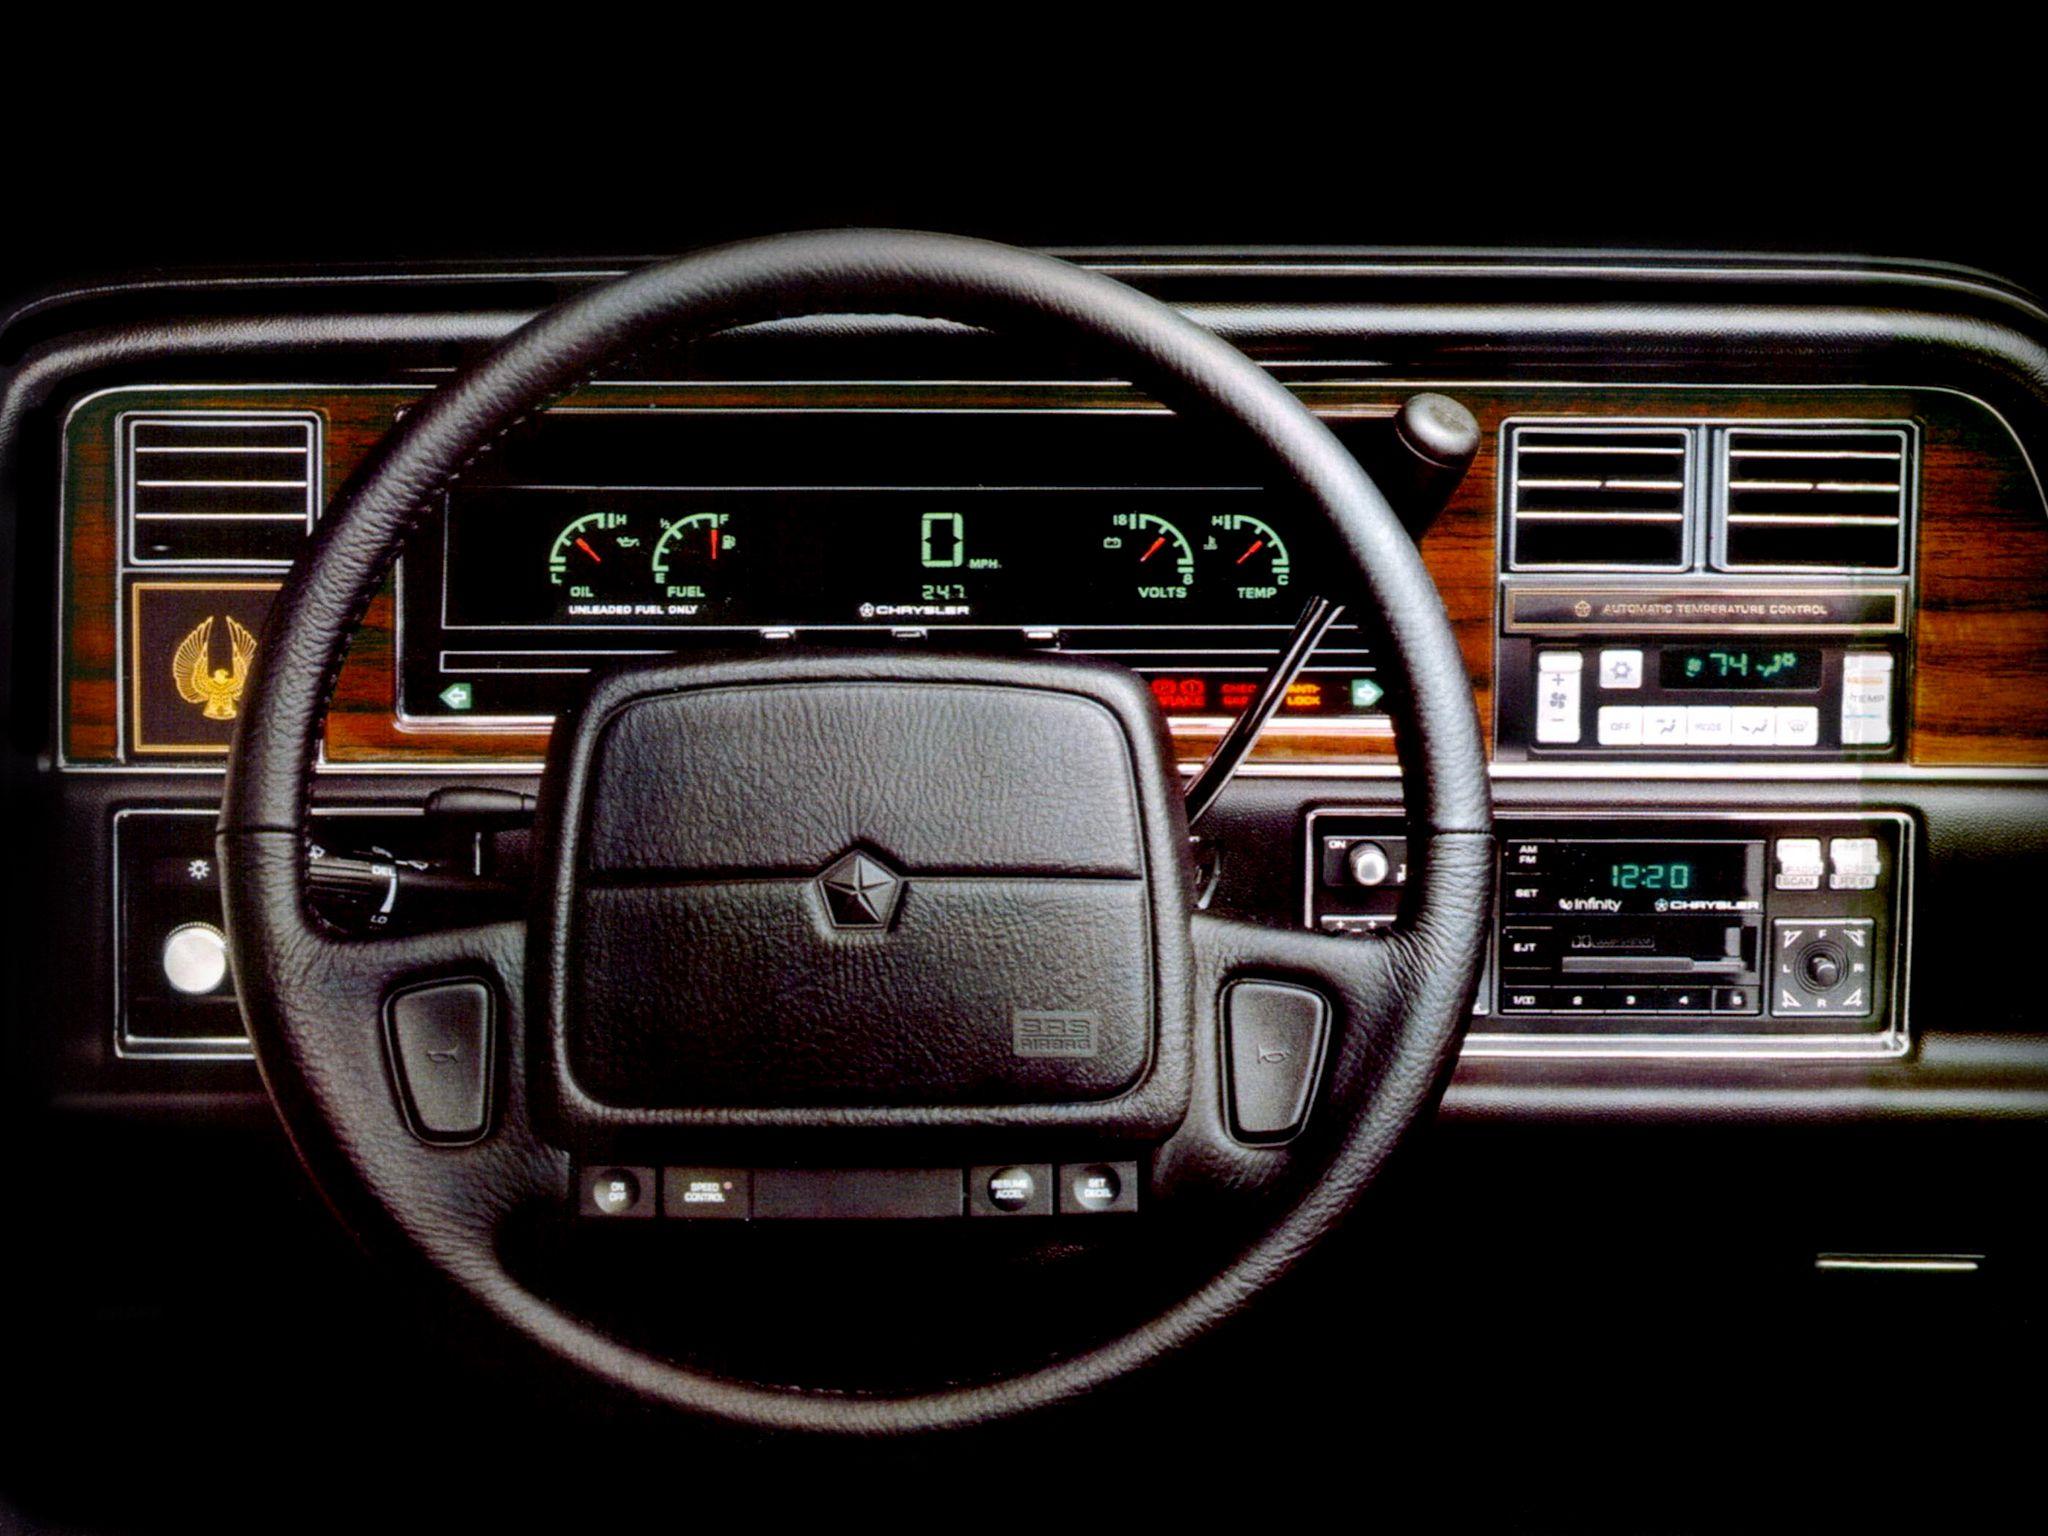 1956 chrysler imperial interior images - 1990 Chrysler Imperial